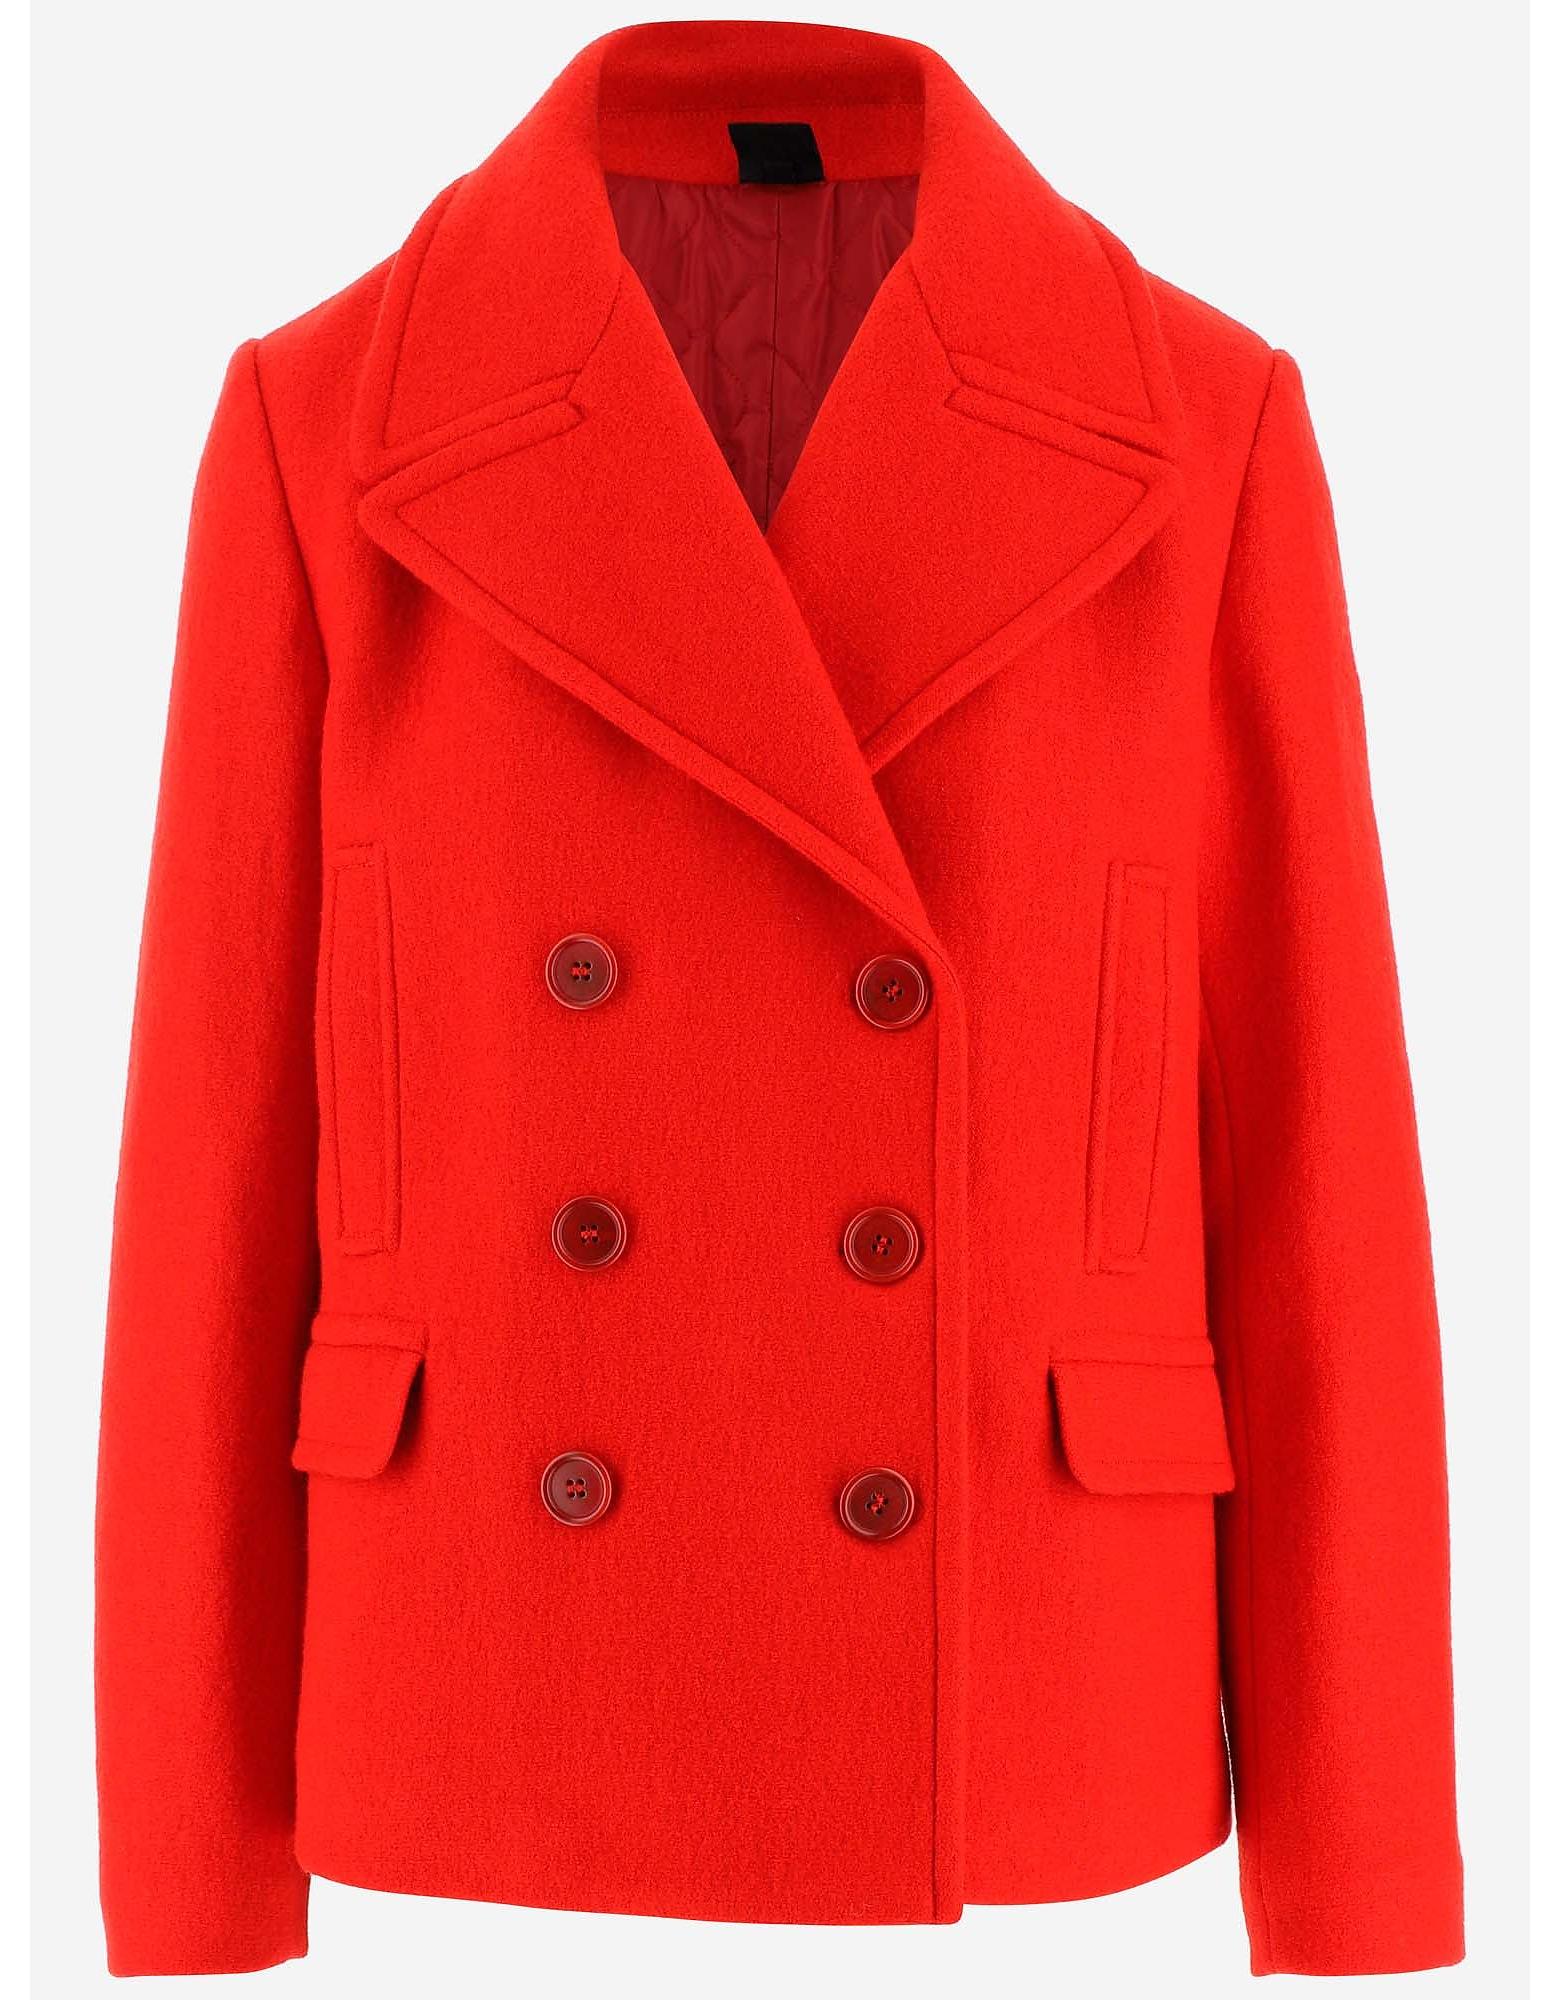 Aspesi Designer Coats & Jackets, Double-breasted Women's Jacket